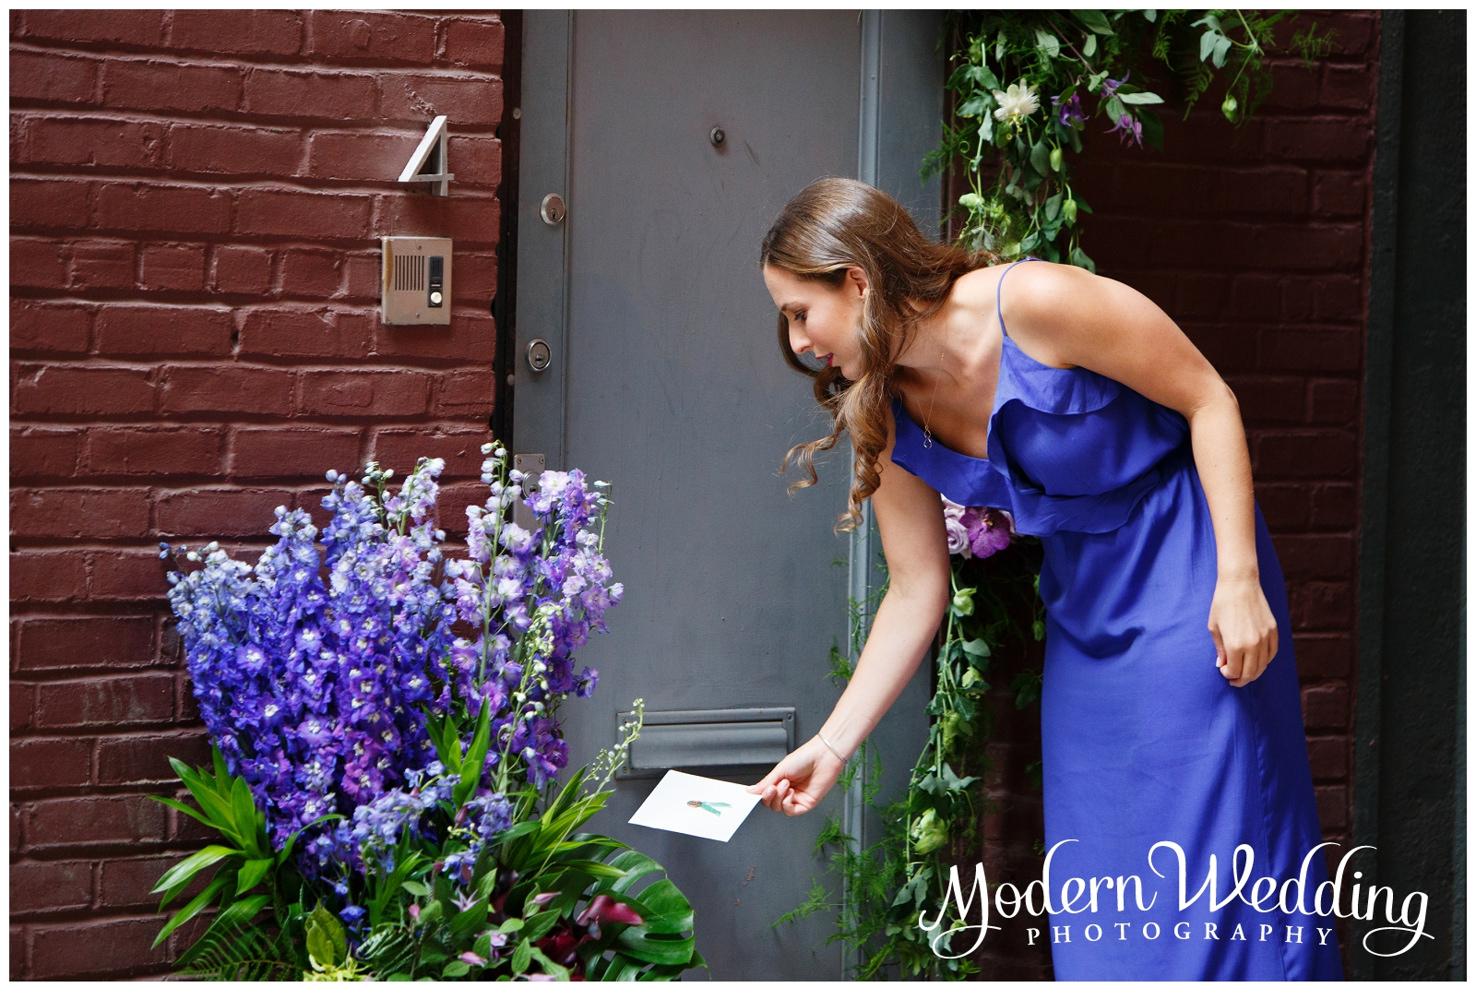 Modern Wedding Photography 08